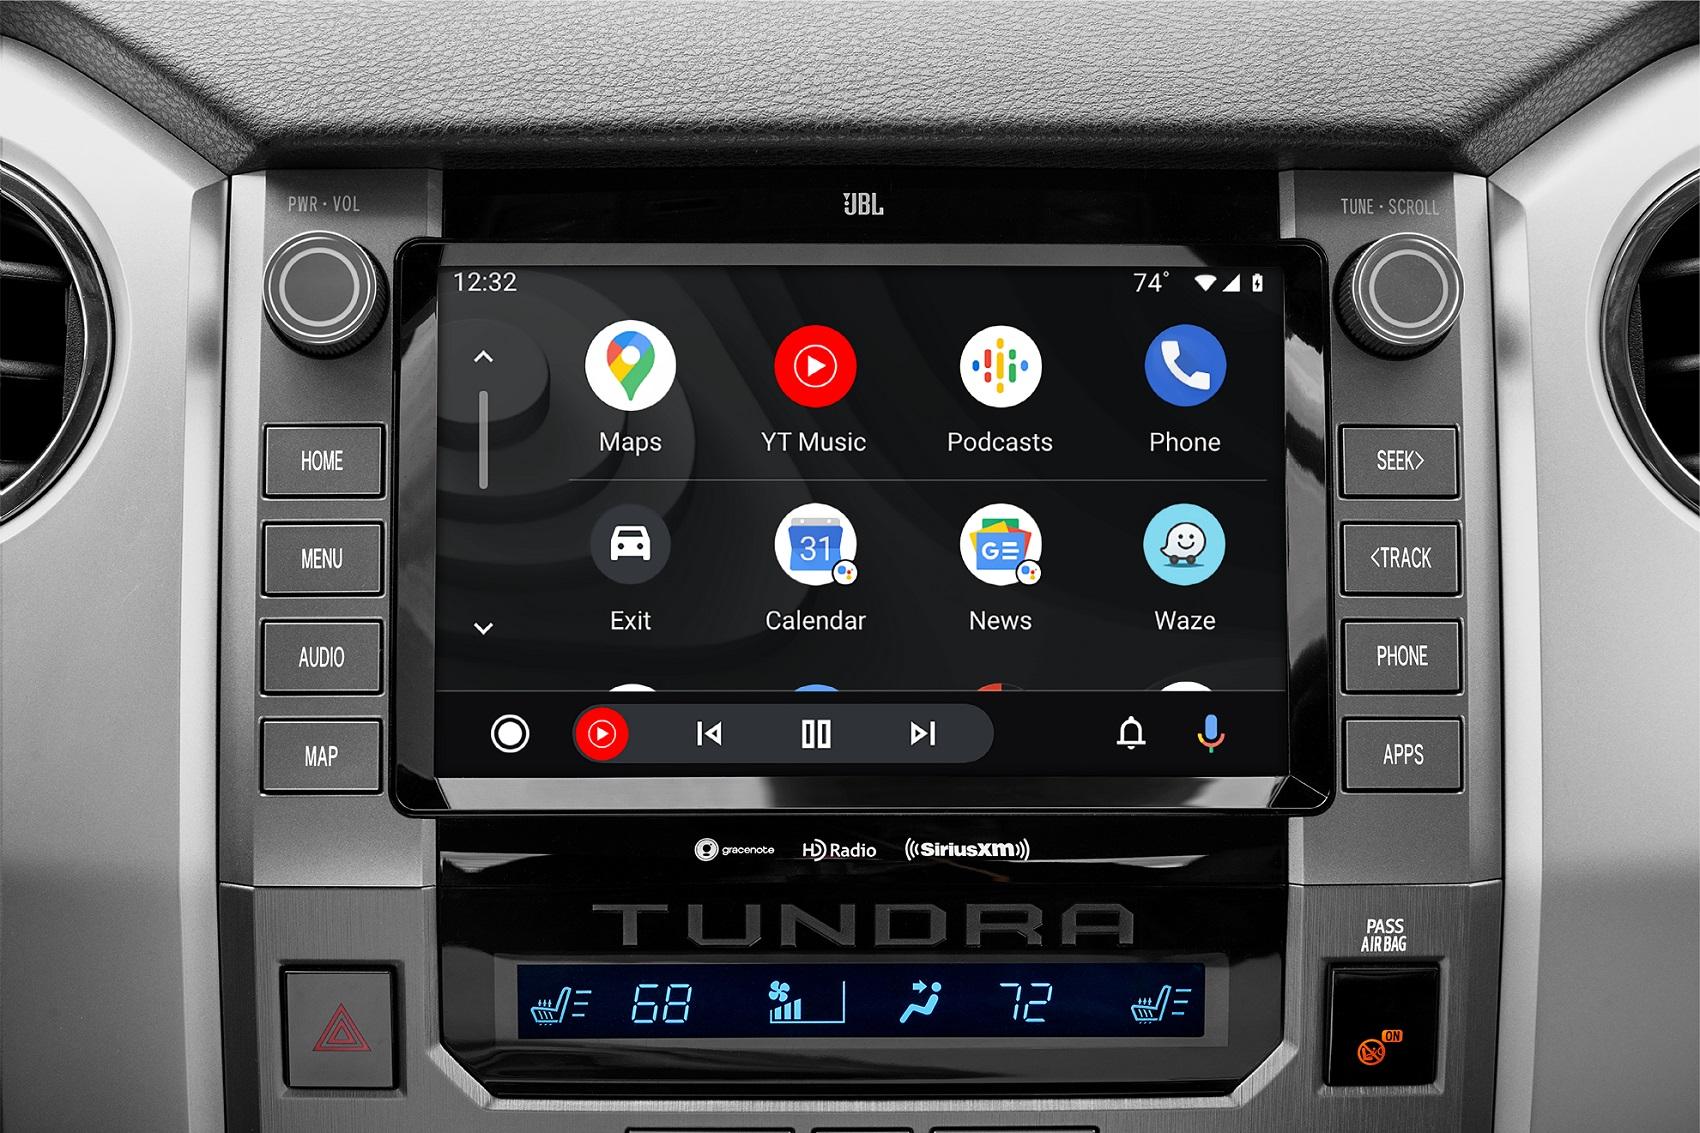 Toyota Tundra Interior with Android Auto™